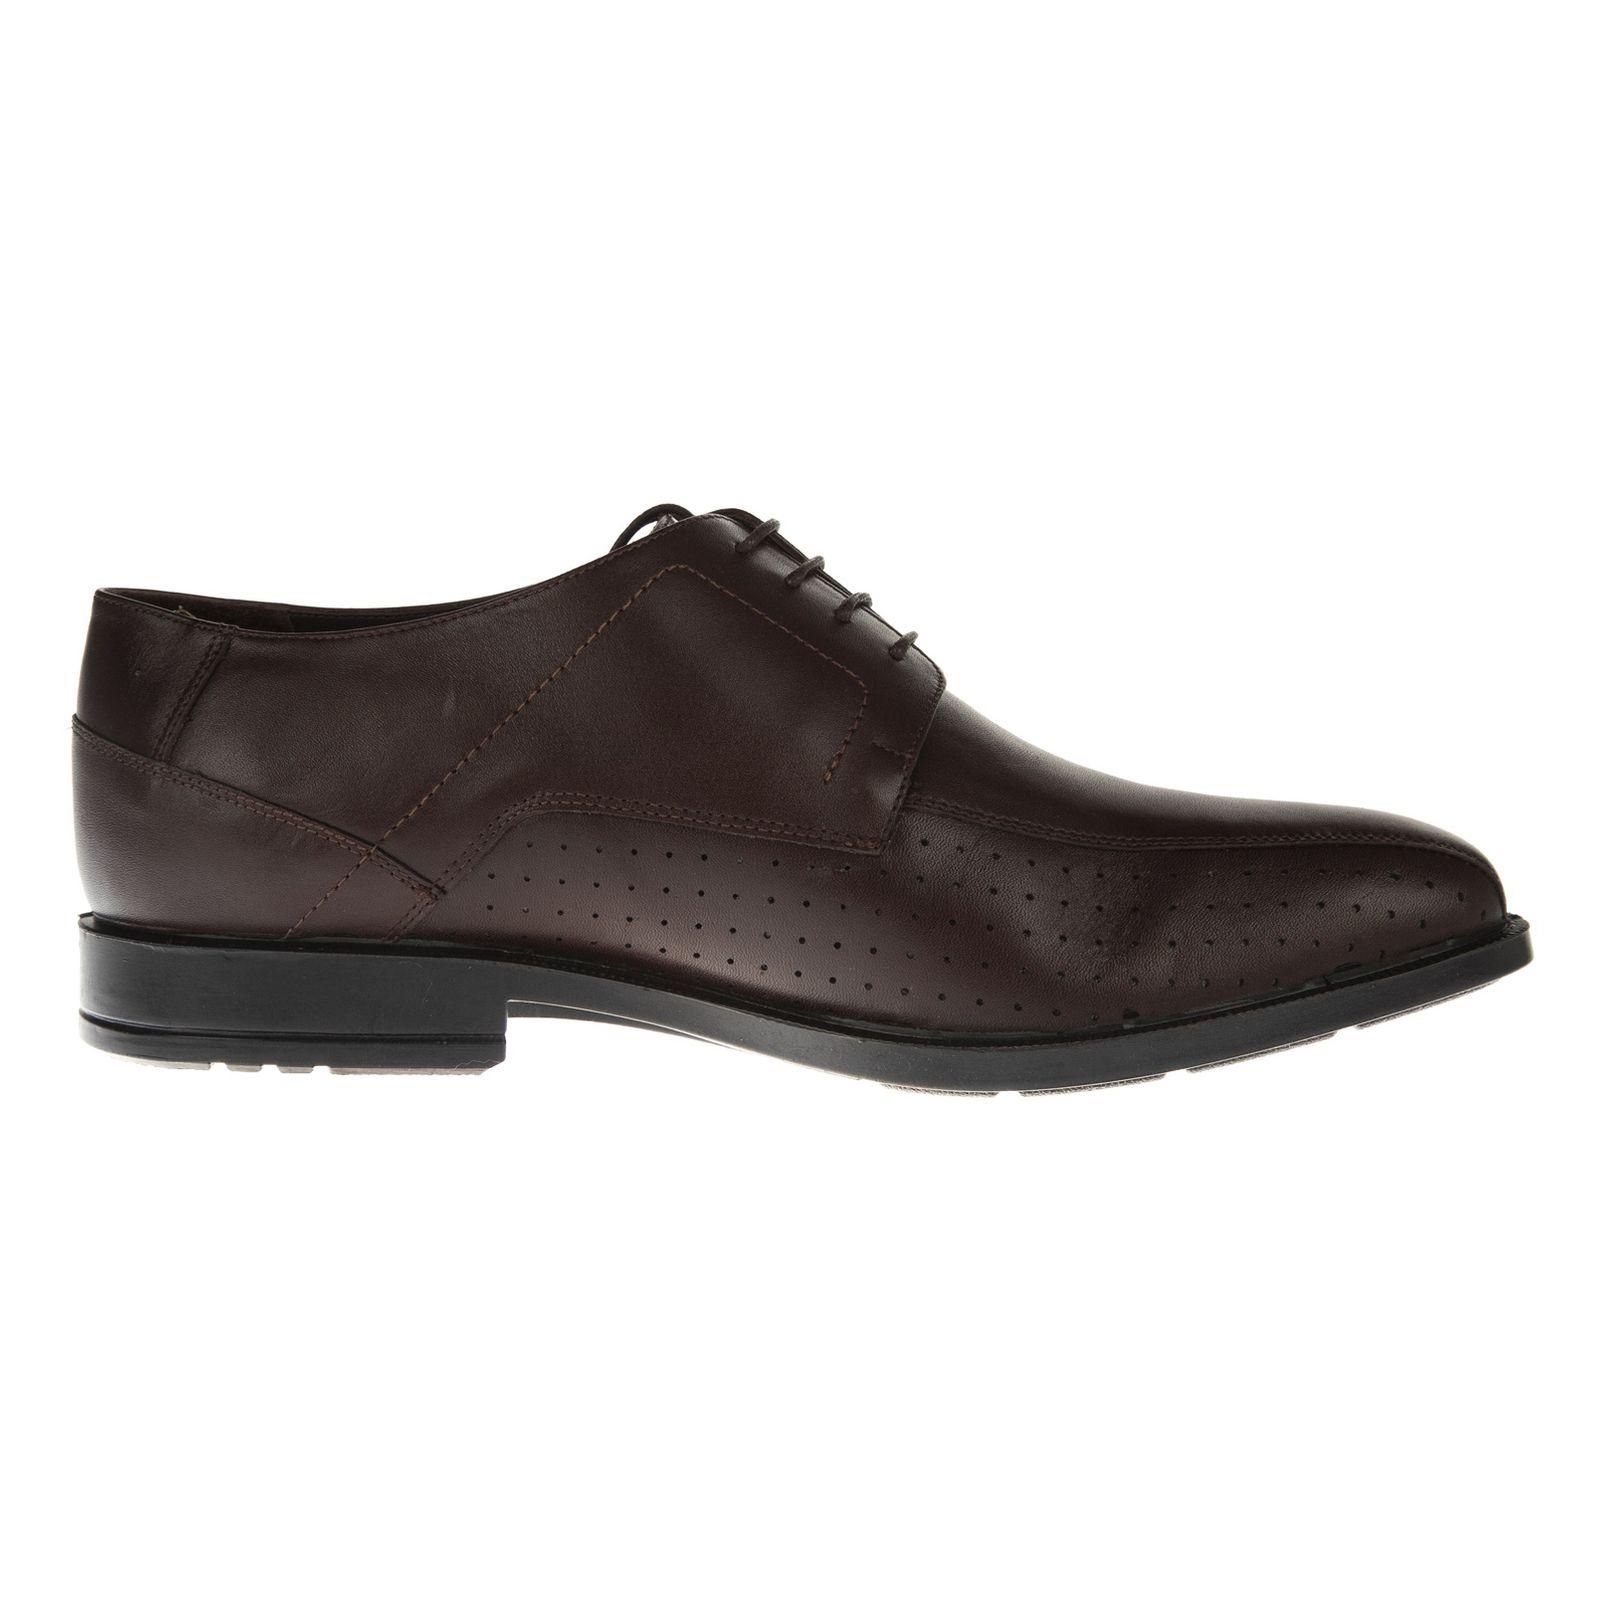 کفش مردانه دنیلی مدل 112070271371